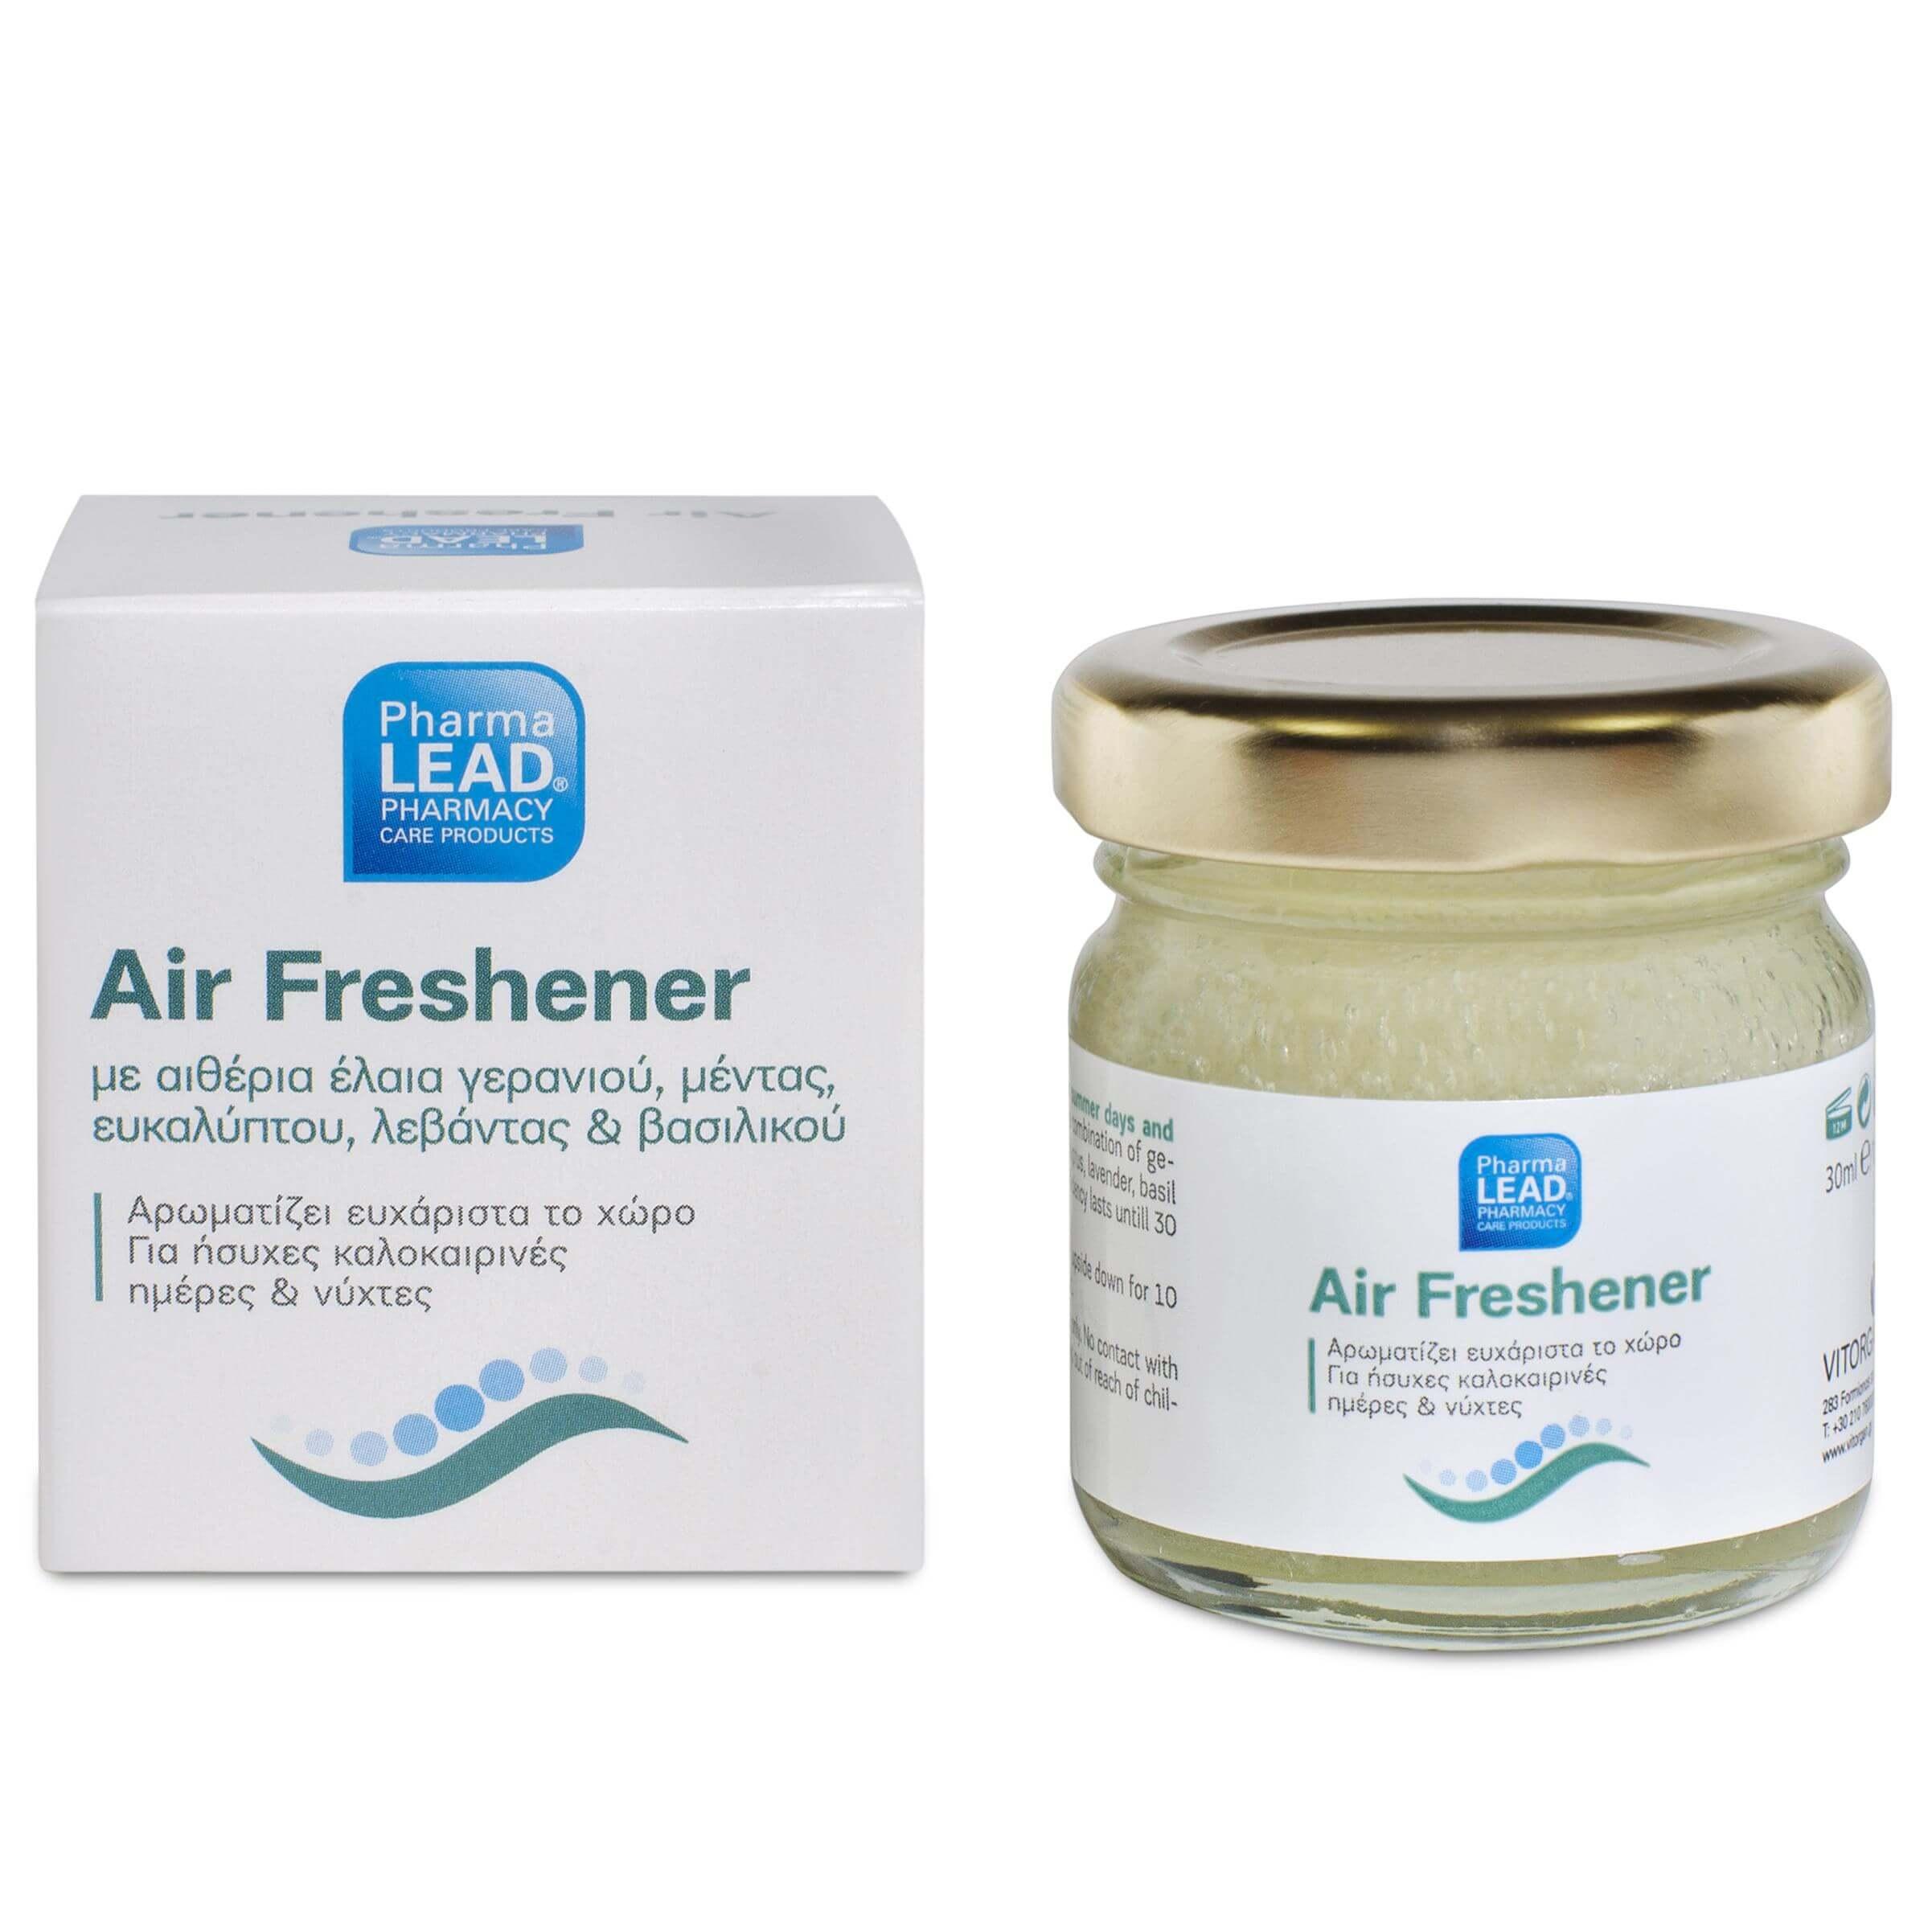 Pharmalead Air Freshener Αρωματίζει Ευχάριστα το Χώρο 30ml